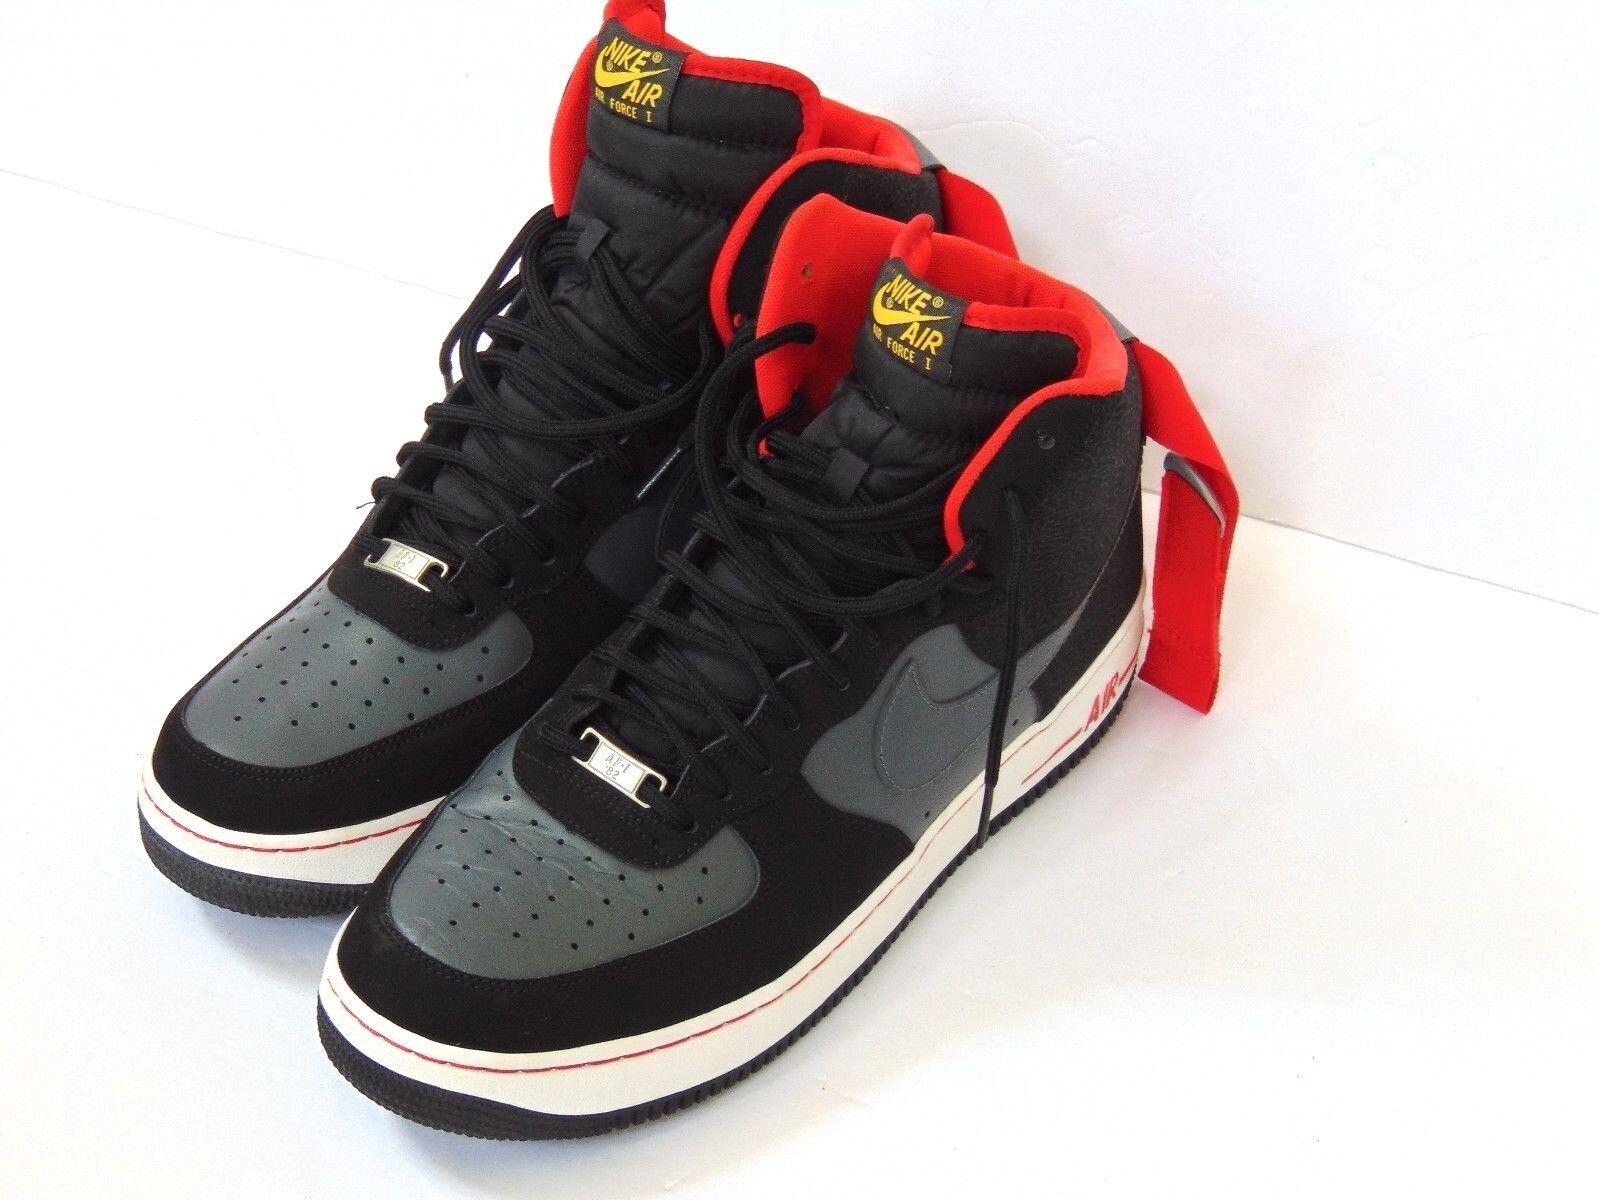 NWOB Nike 315121 015 Air Force 1 Black / Grey / Red Men's Basketball Shoes sz 12